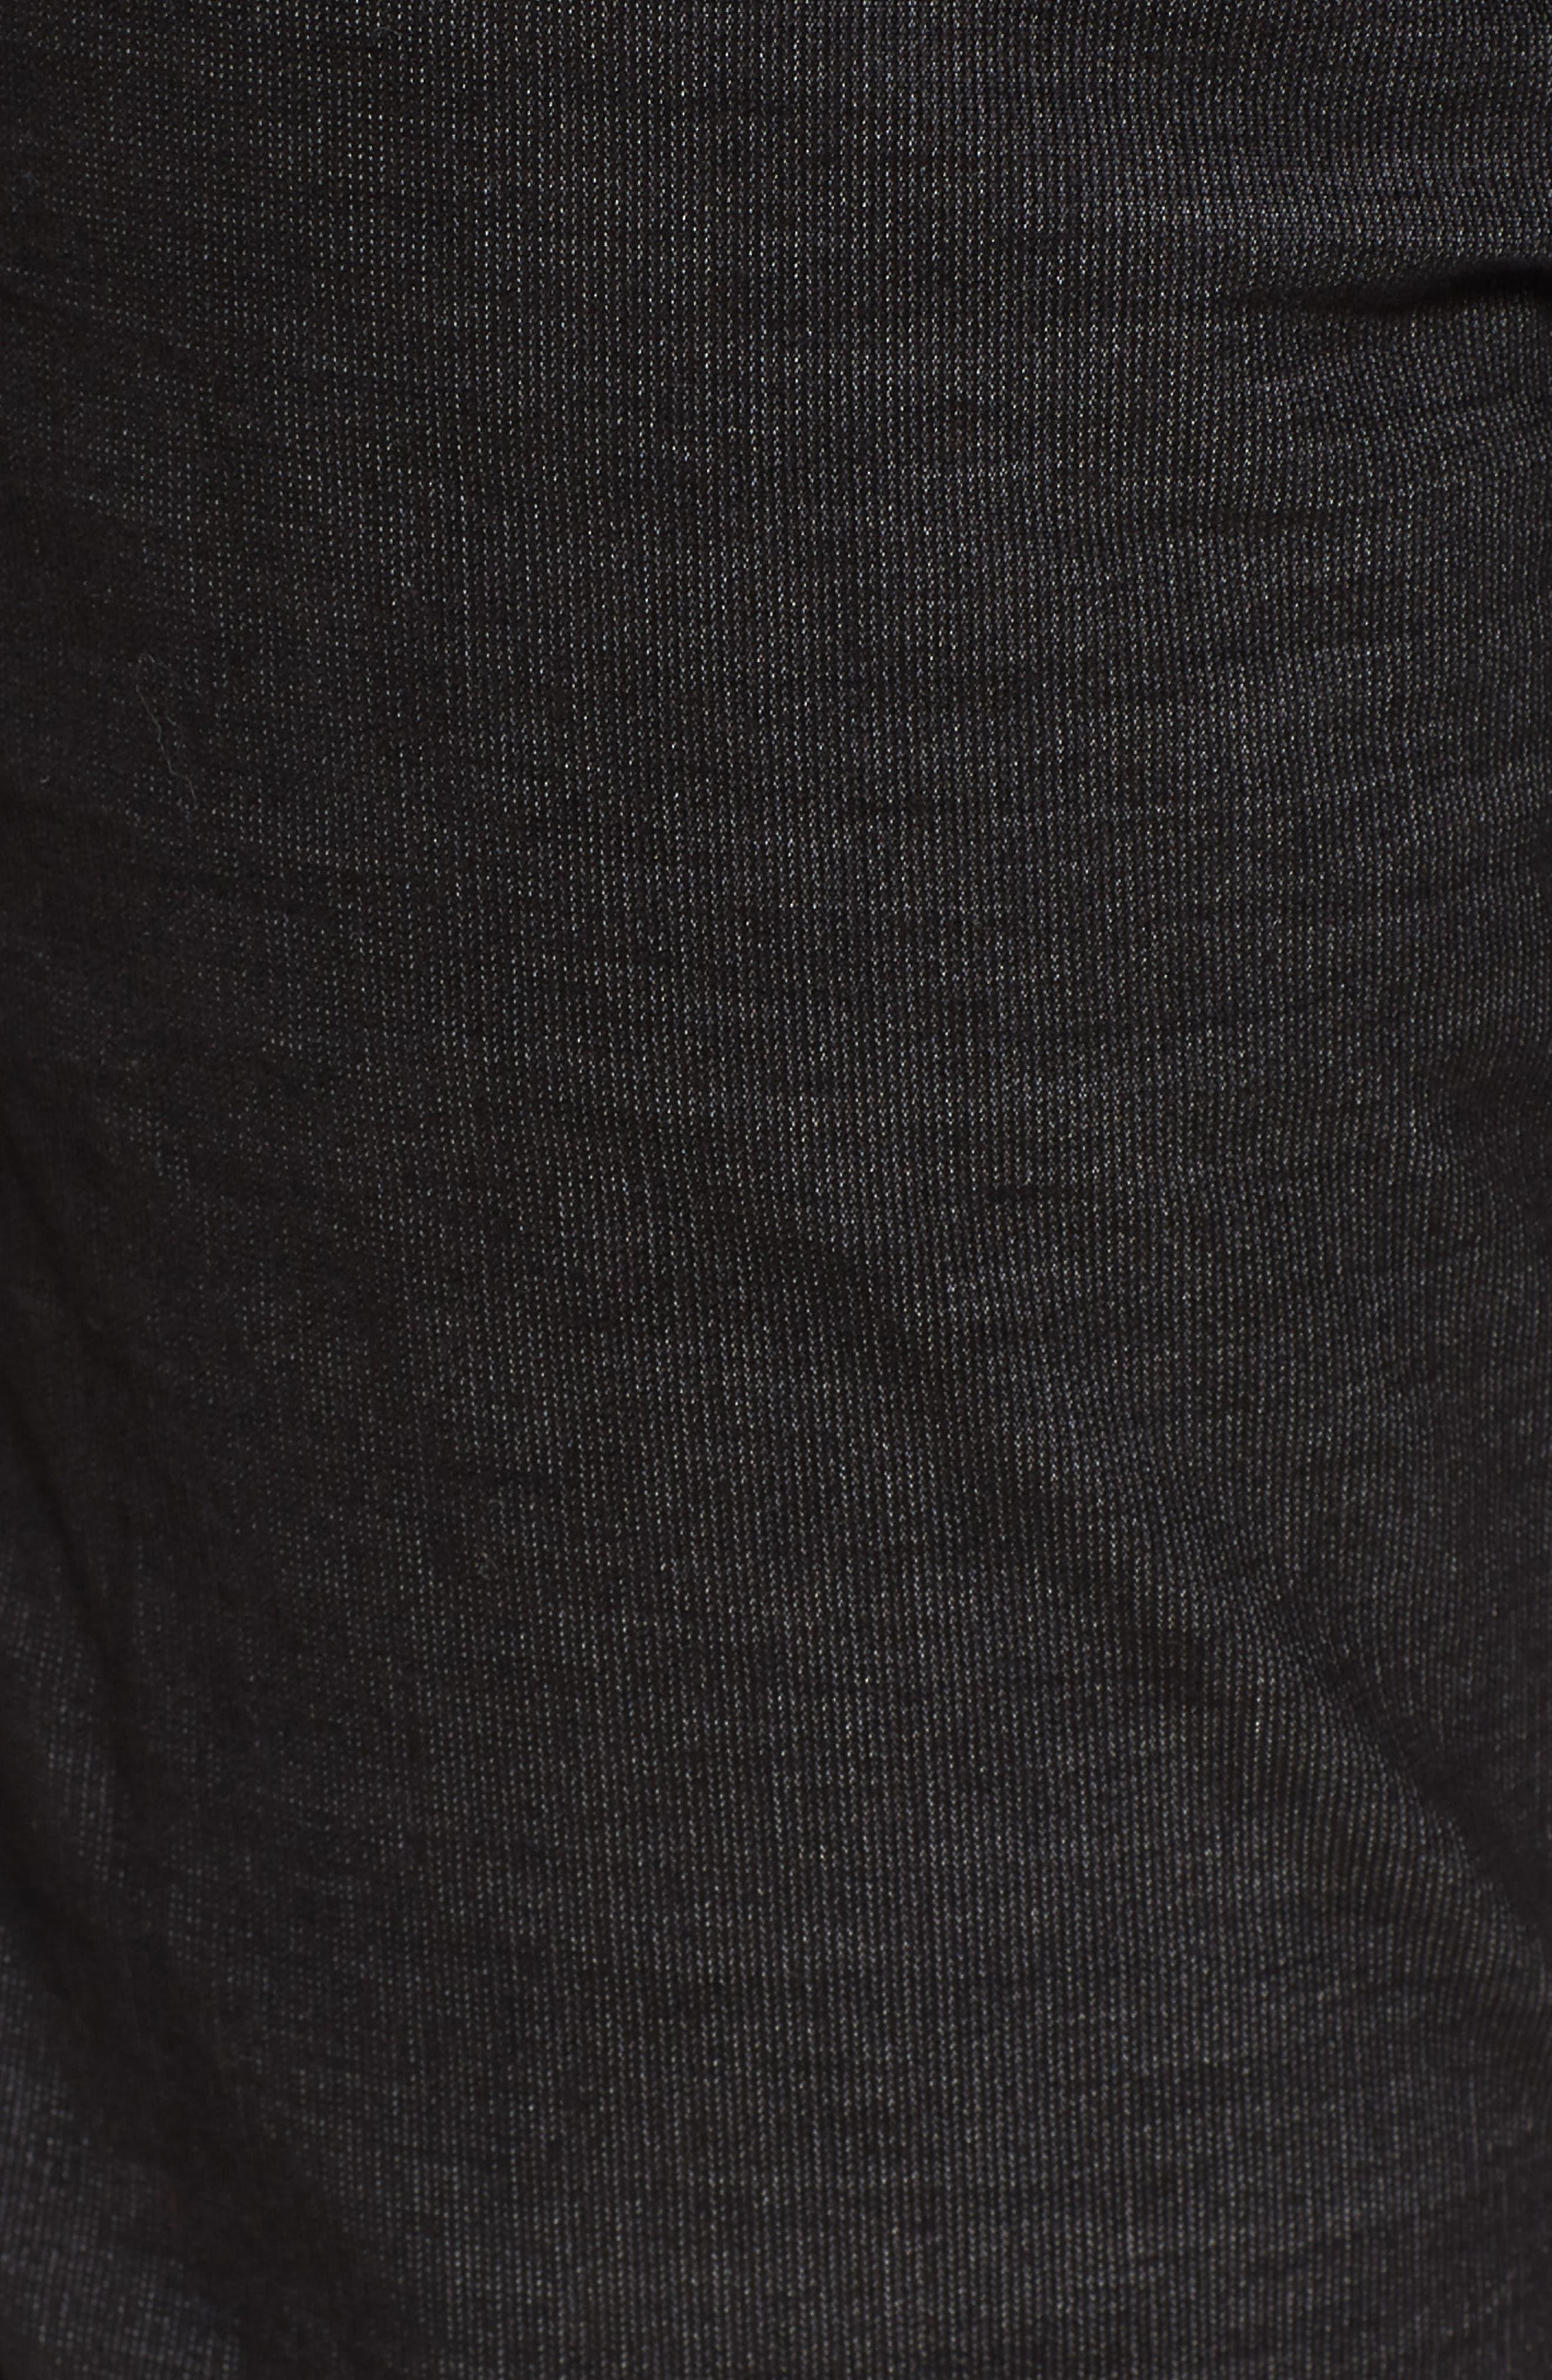 Rocco Skinny Fit Corduroy Jeans,                             Alternate thumbnail 5, color,                             Black